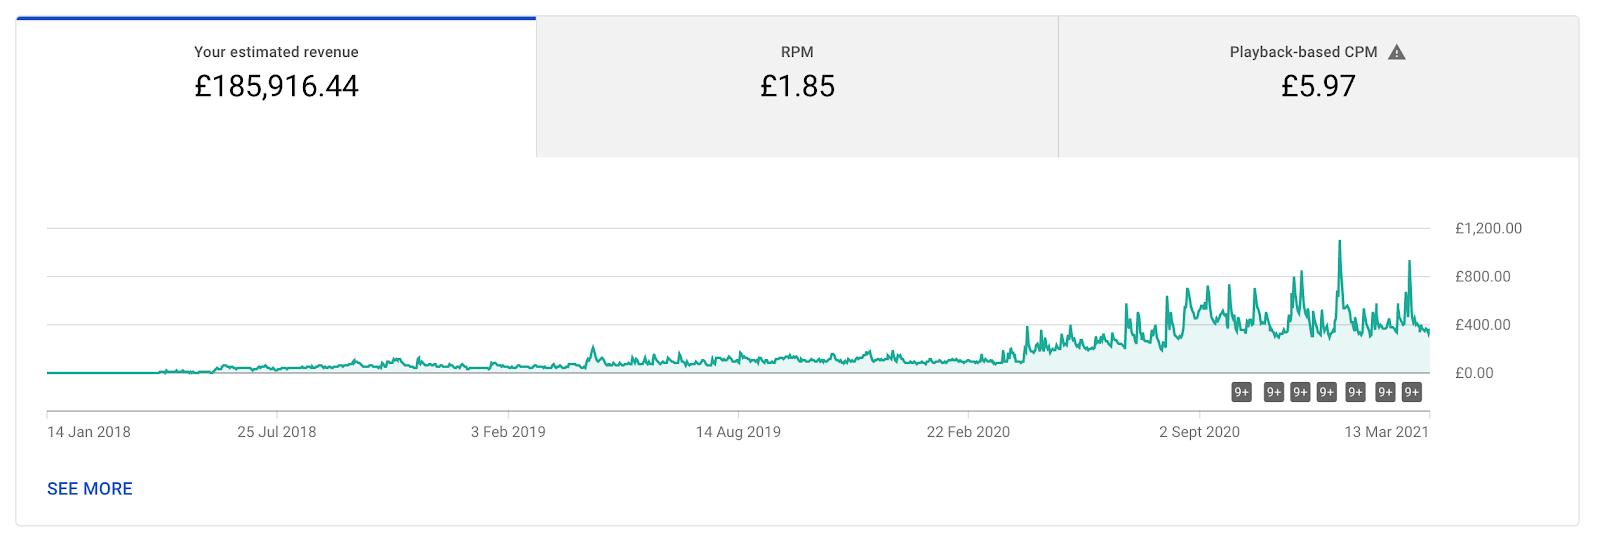 My RPM, CPM and estimated revenue